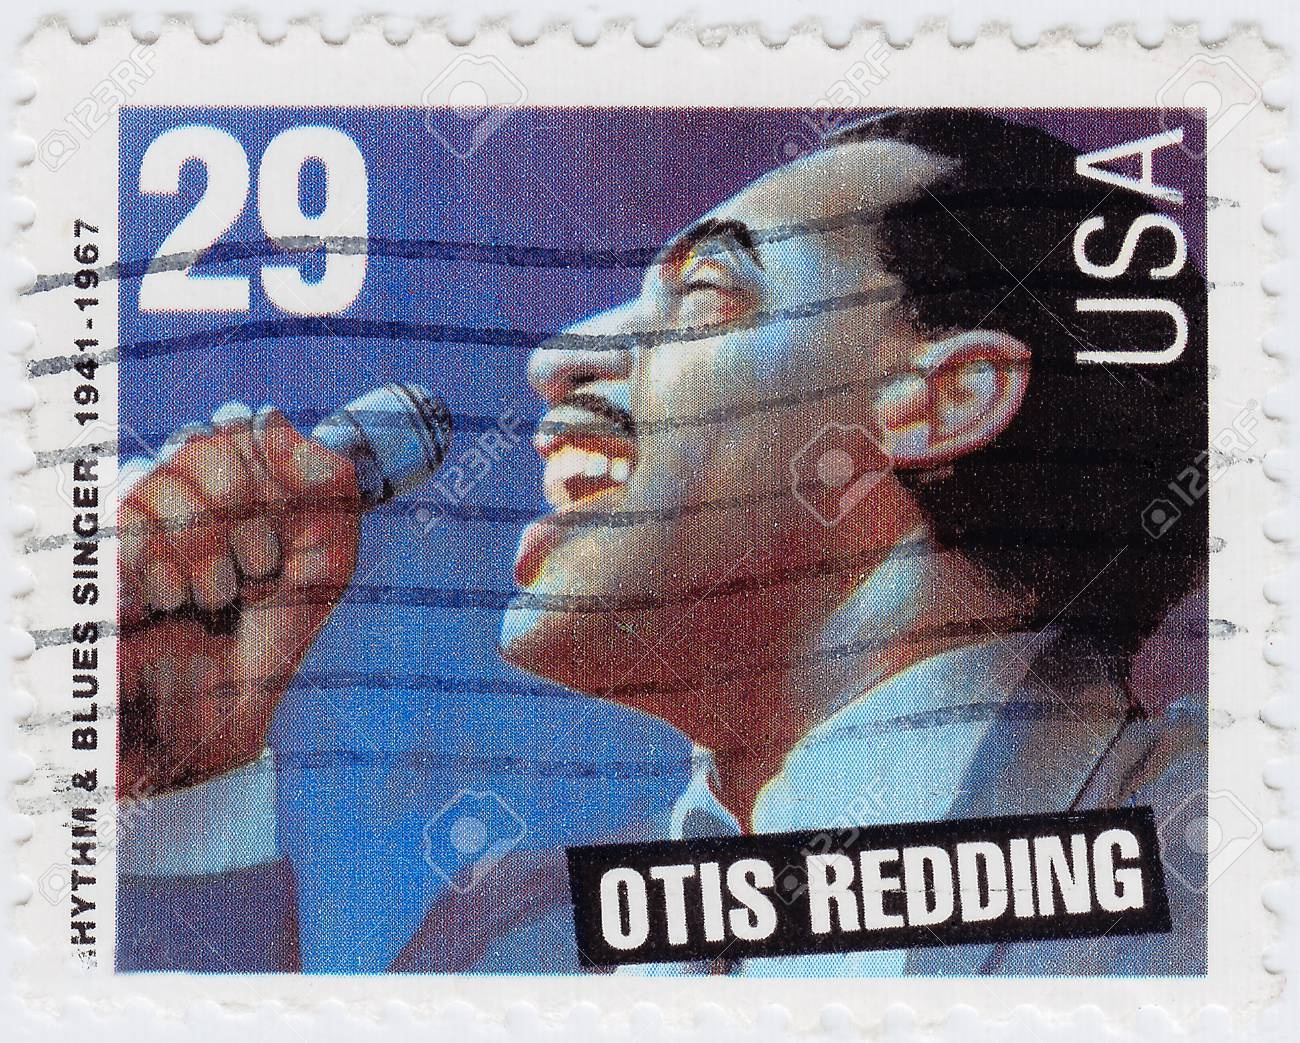 USA - CIRCA 1997 : stamp printed in USA shows Otis  Redding is an Rhythm and Blues singer, circa 1997 Stock Photo - 15837505